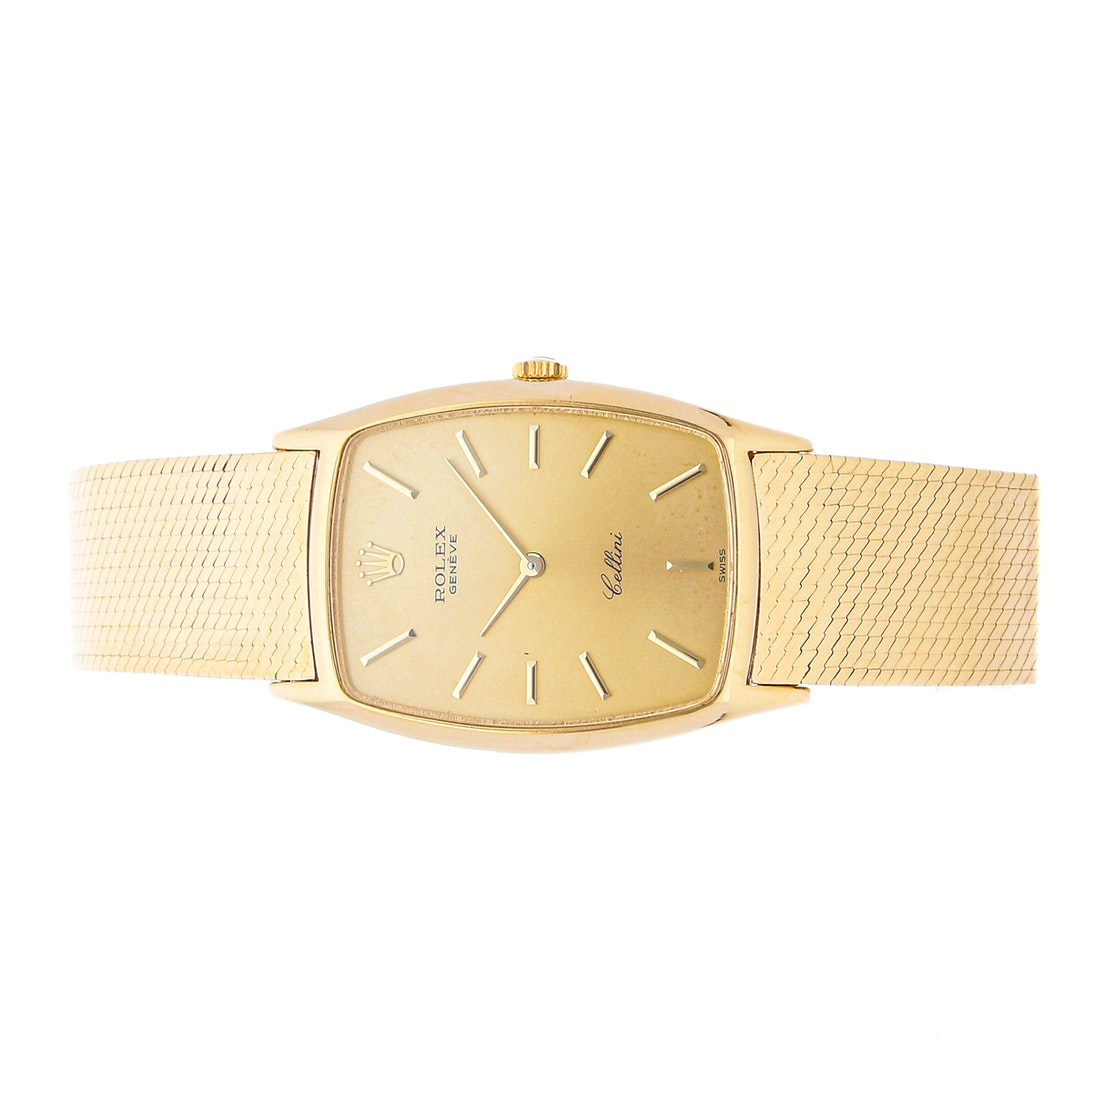 Rolex Cellini 3807